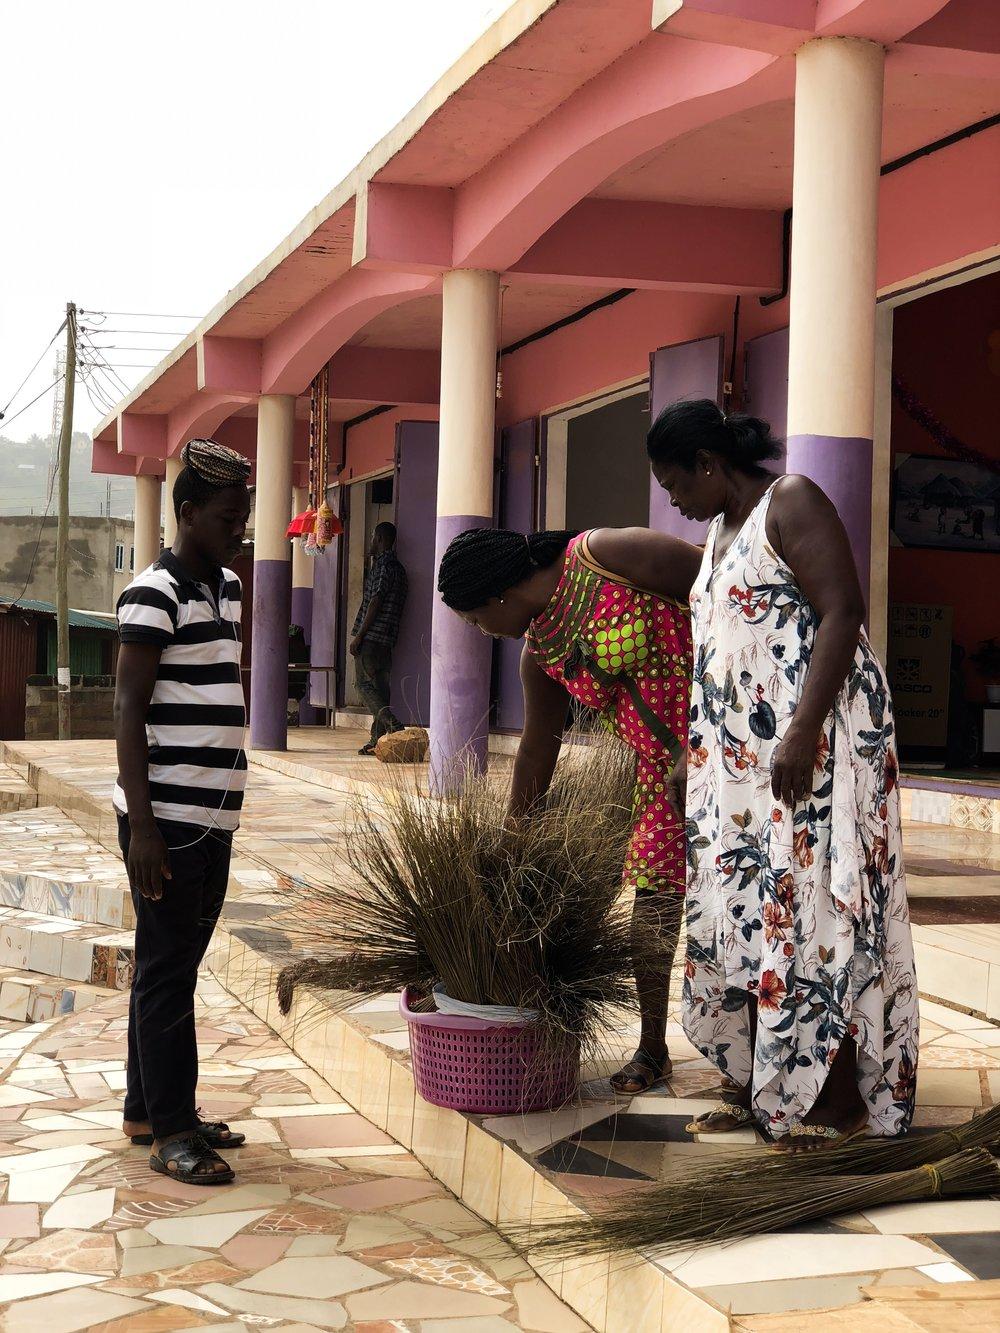 Ghana broom seller